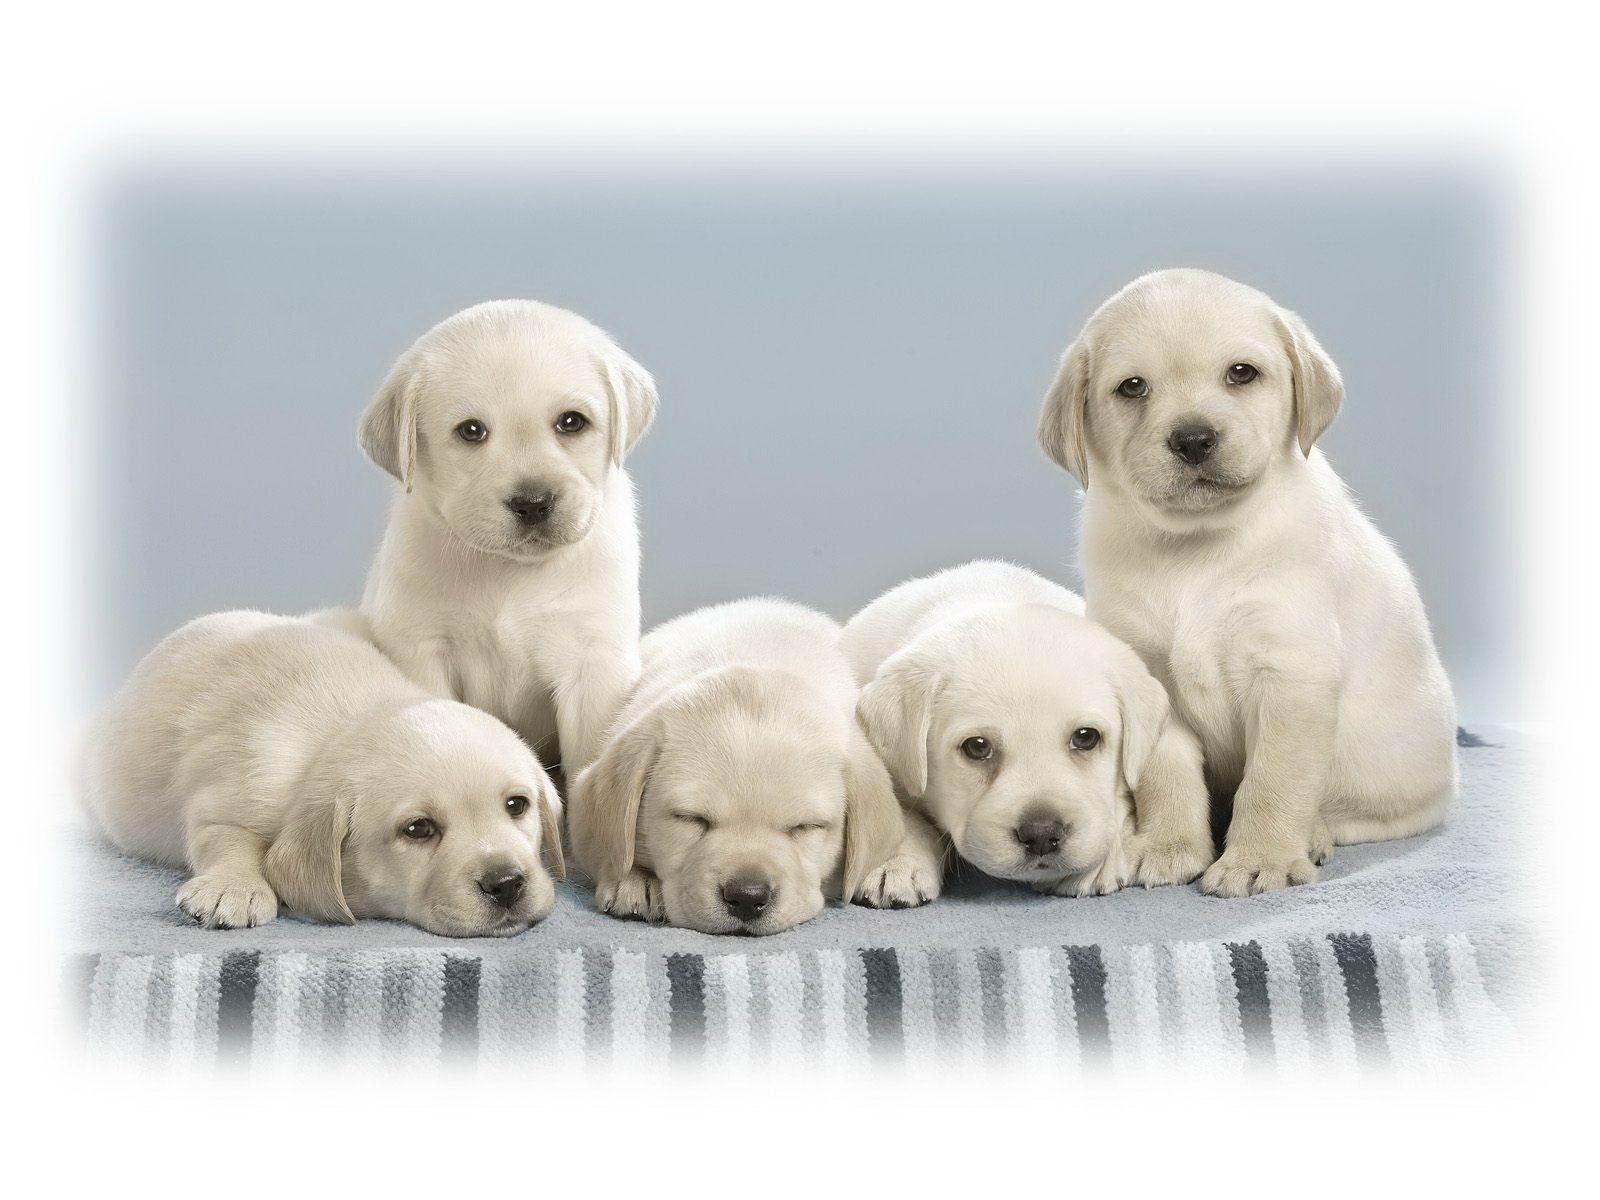 http://4.bp.blogspot.com/-Hh4zc7qJCMc/T925zEjA__I/AAAAAAAAAXs/Xk1kyHM7T9U/s1600/wallpaper+anak+anjing+putih.jpg